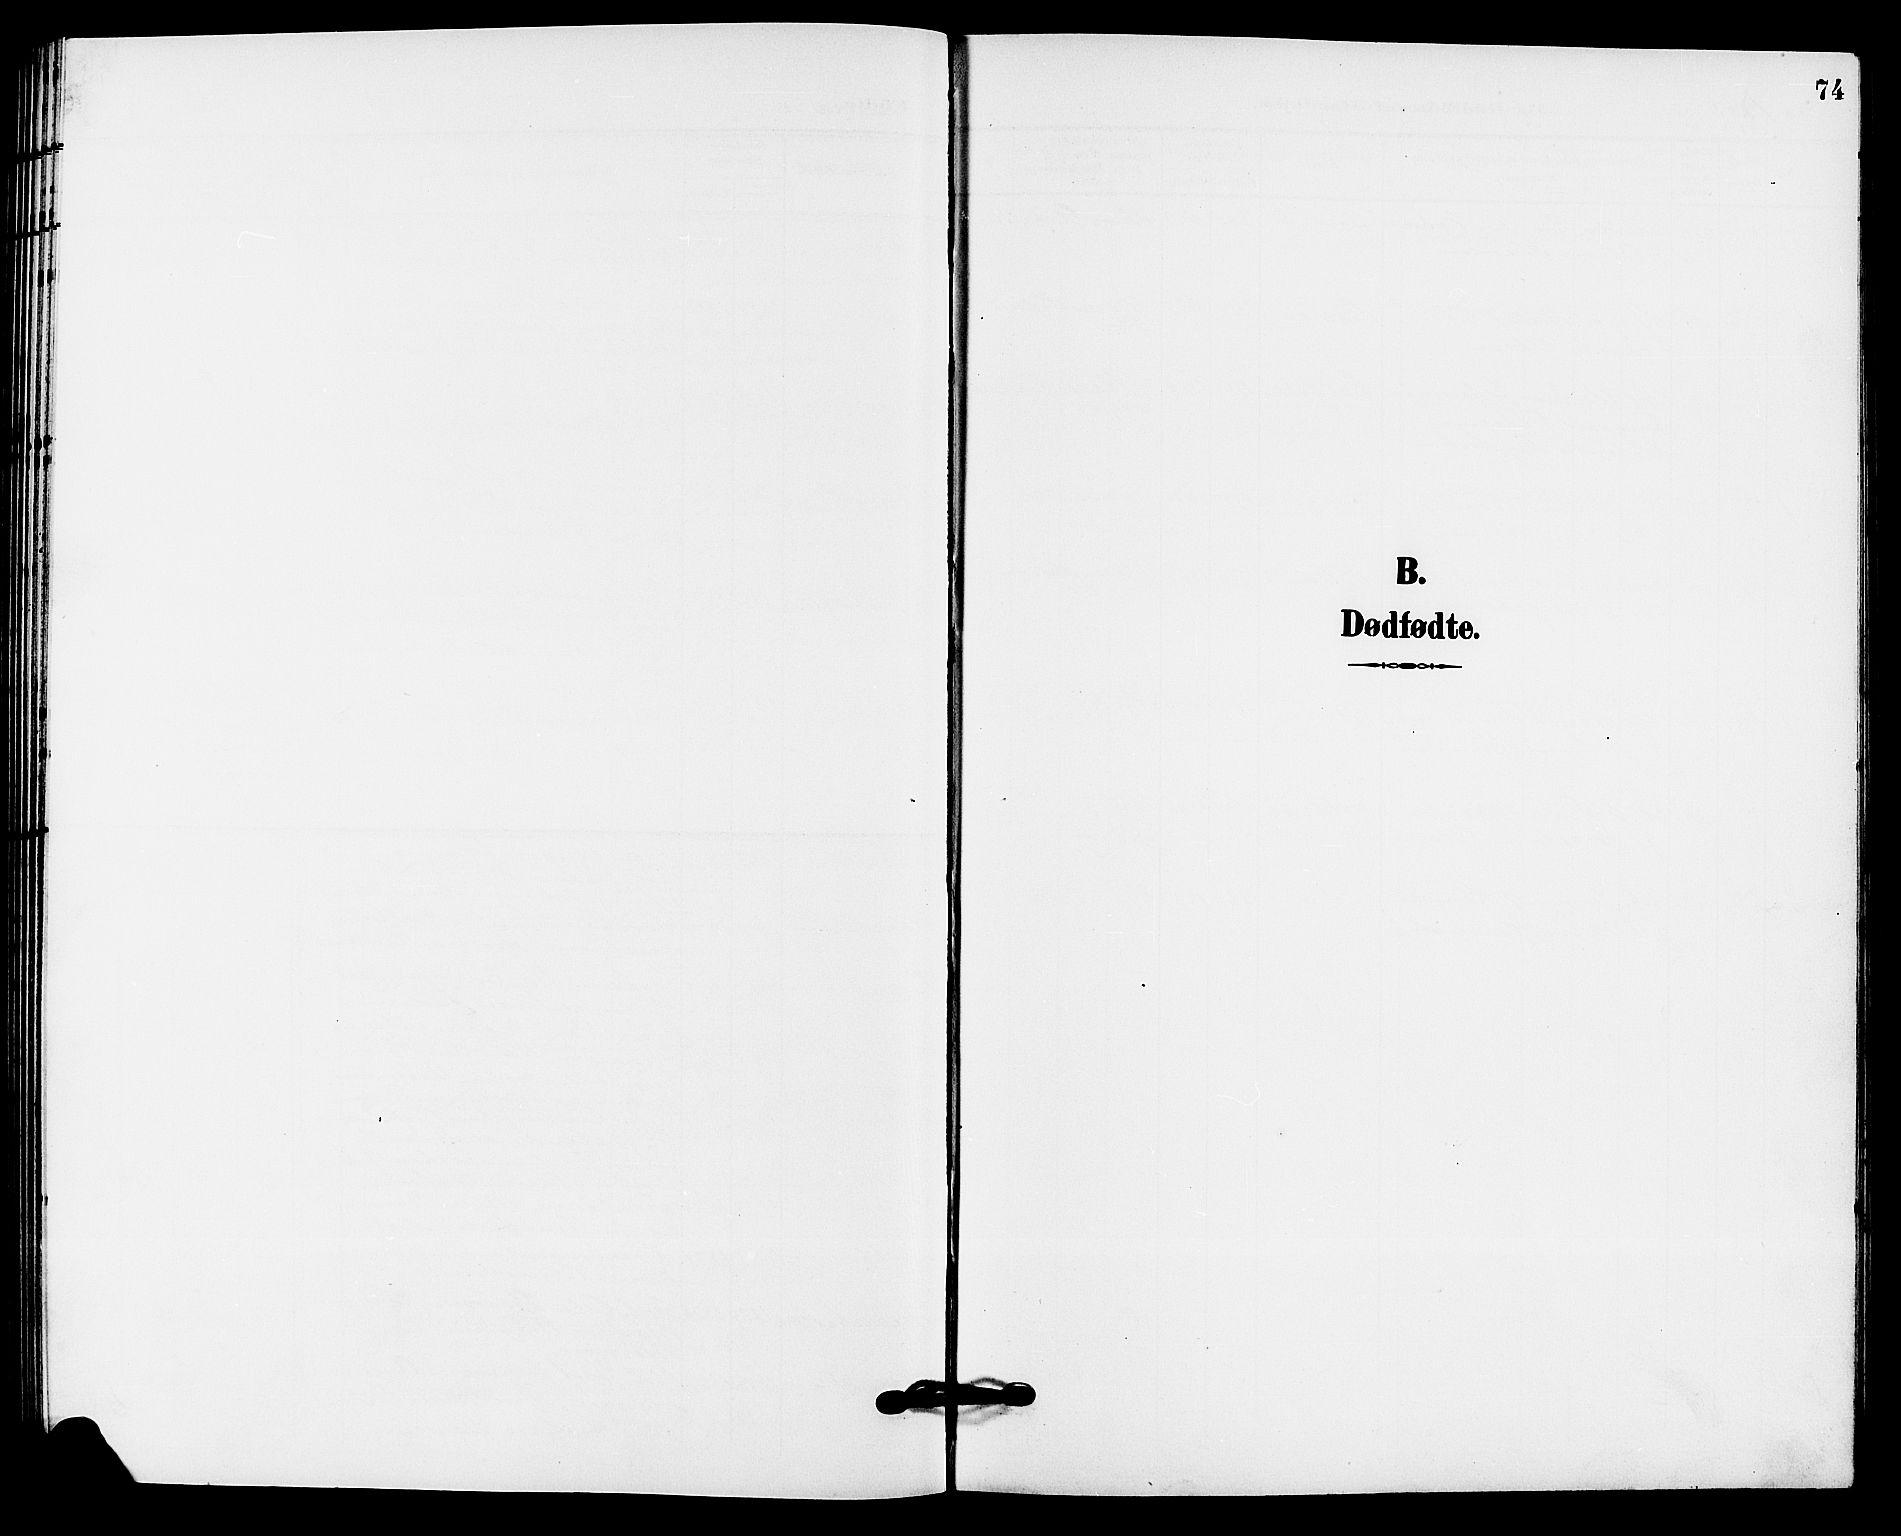 SAKO, Solum kirkebøker, G/Gb/L0004: Klokkerbok nr. II 4, 1898-1905, s. 74